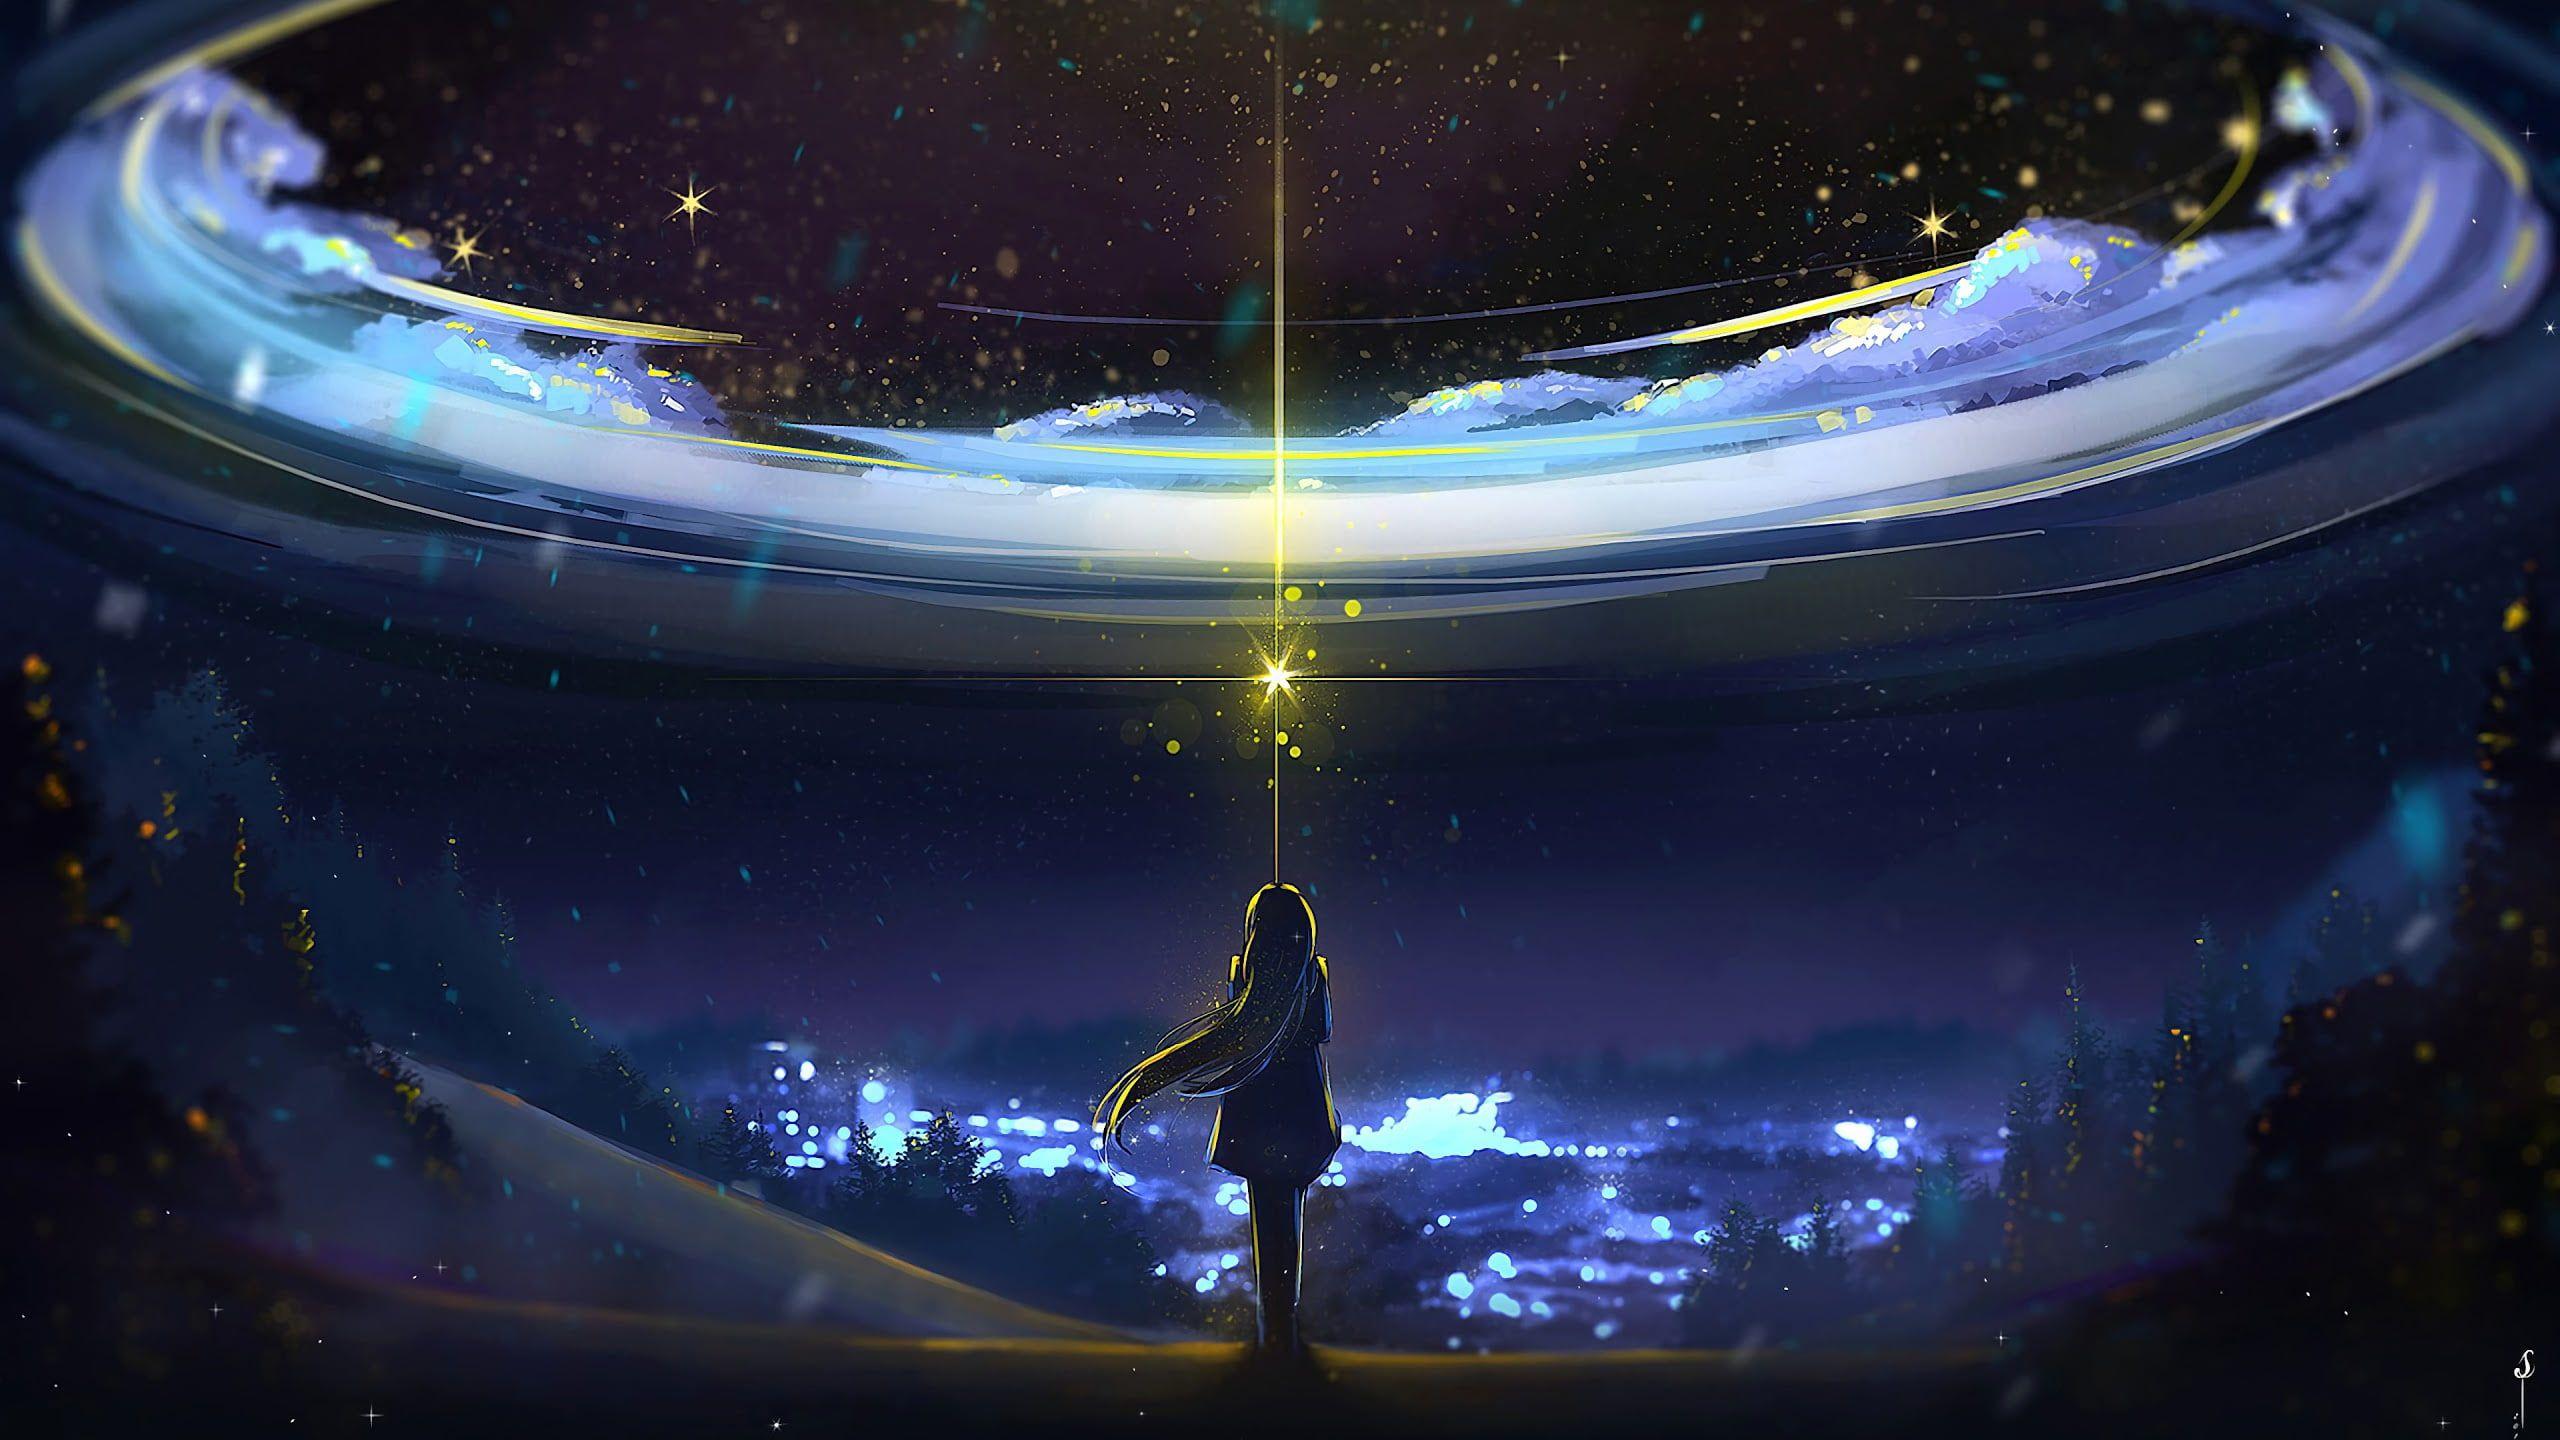 Sky Anime Night Scenery 2k Wallpaper Hdwallpaper Desktop In 2021 Sky Anime Anime Scenery Night Scenery